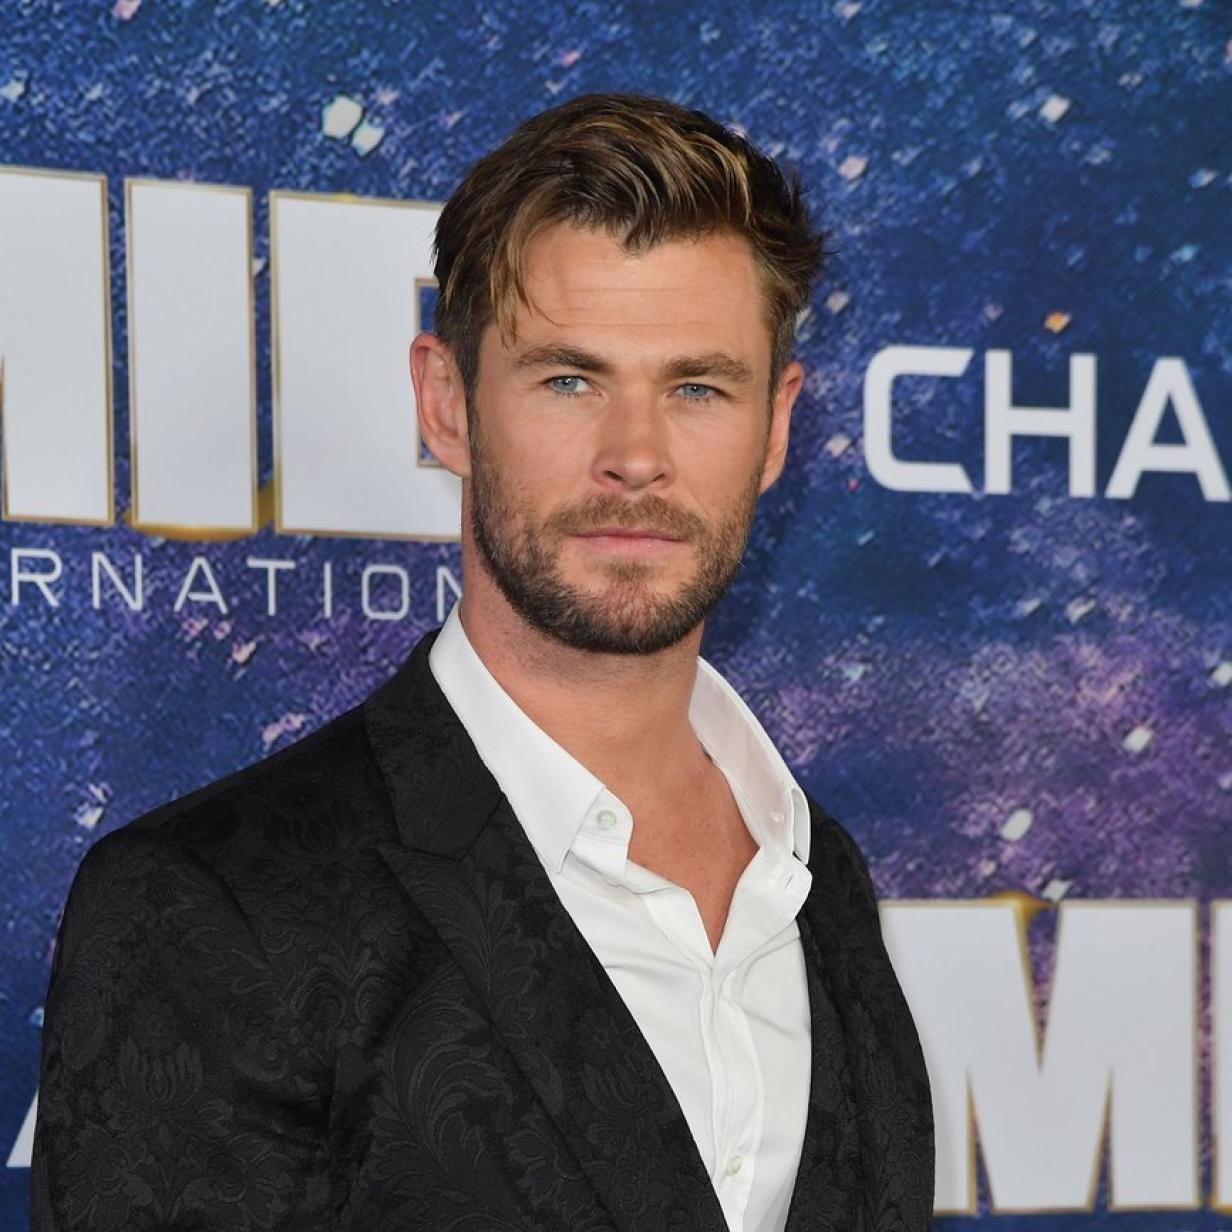 Fridays for Future: Chris Hemsworth nahm an Klima-Streik teil